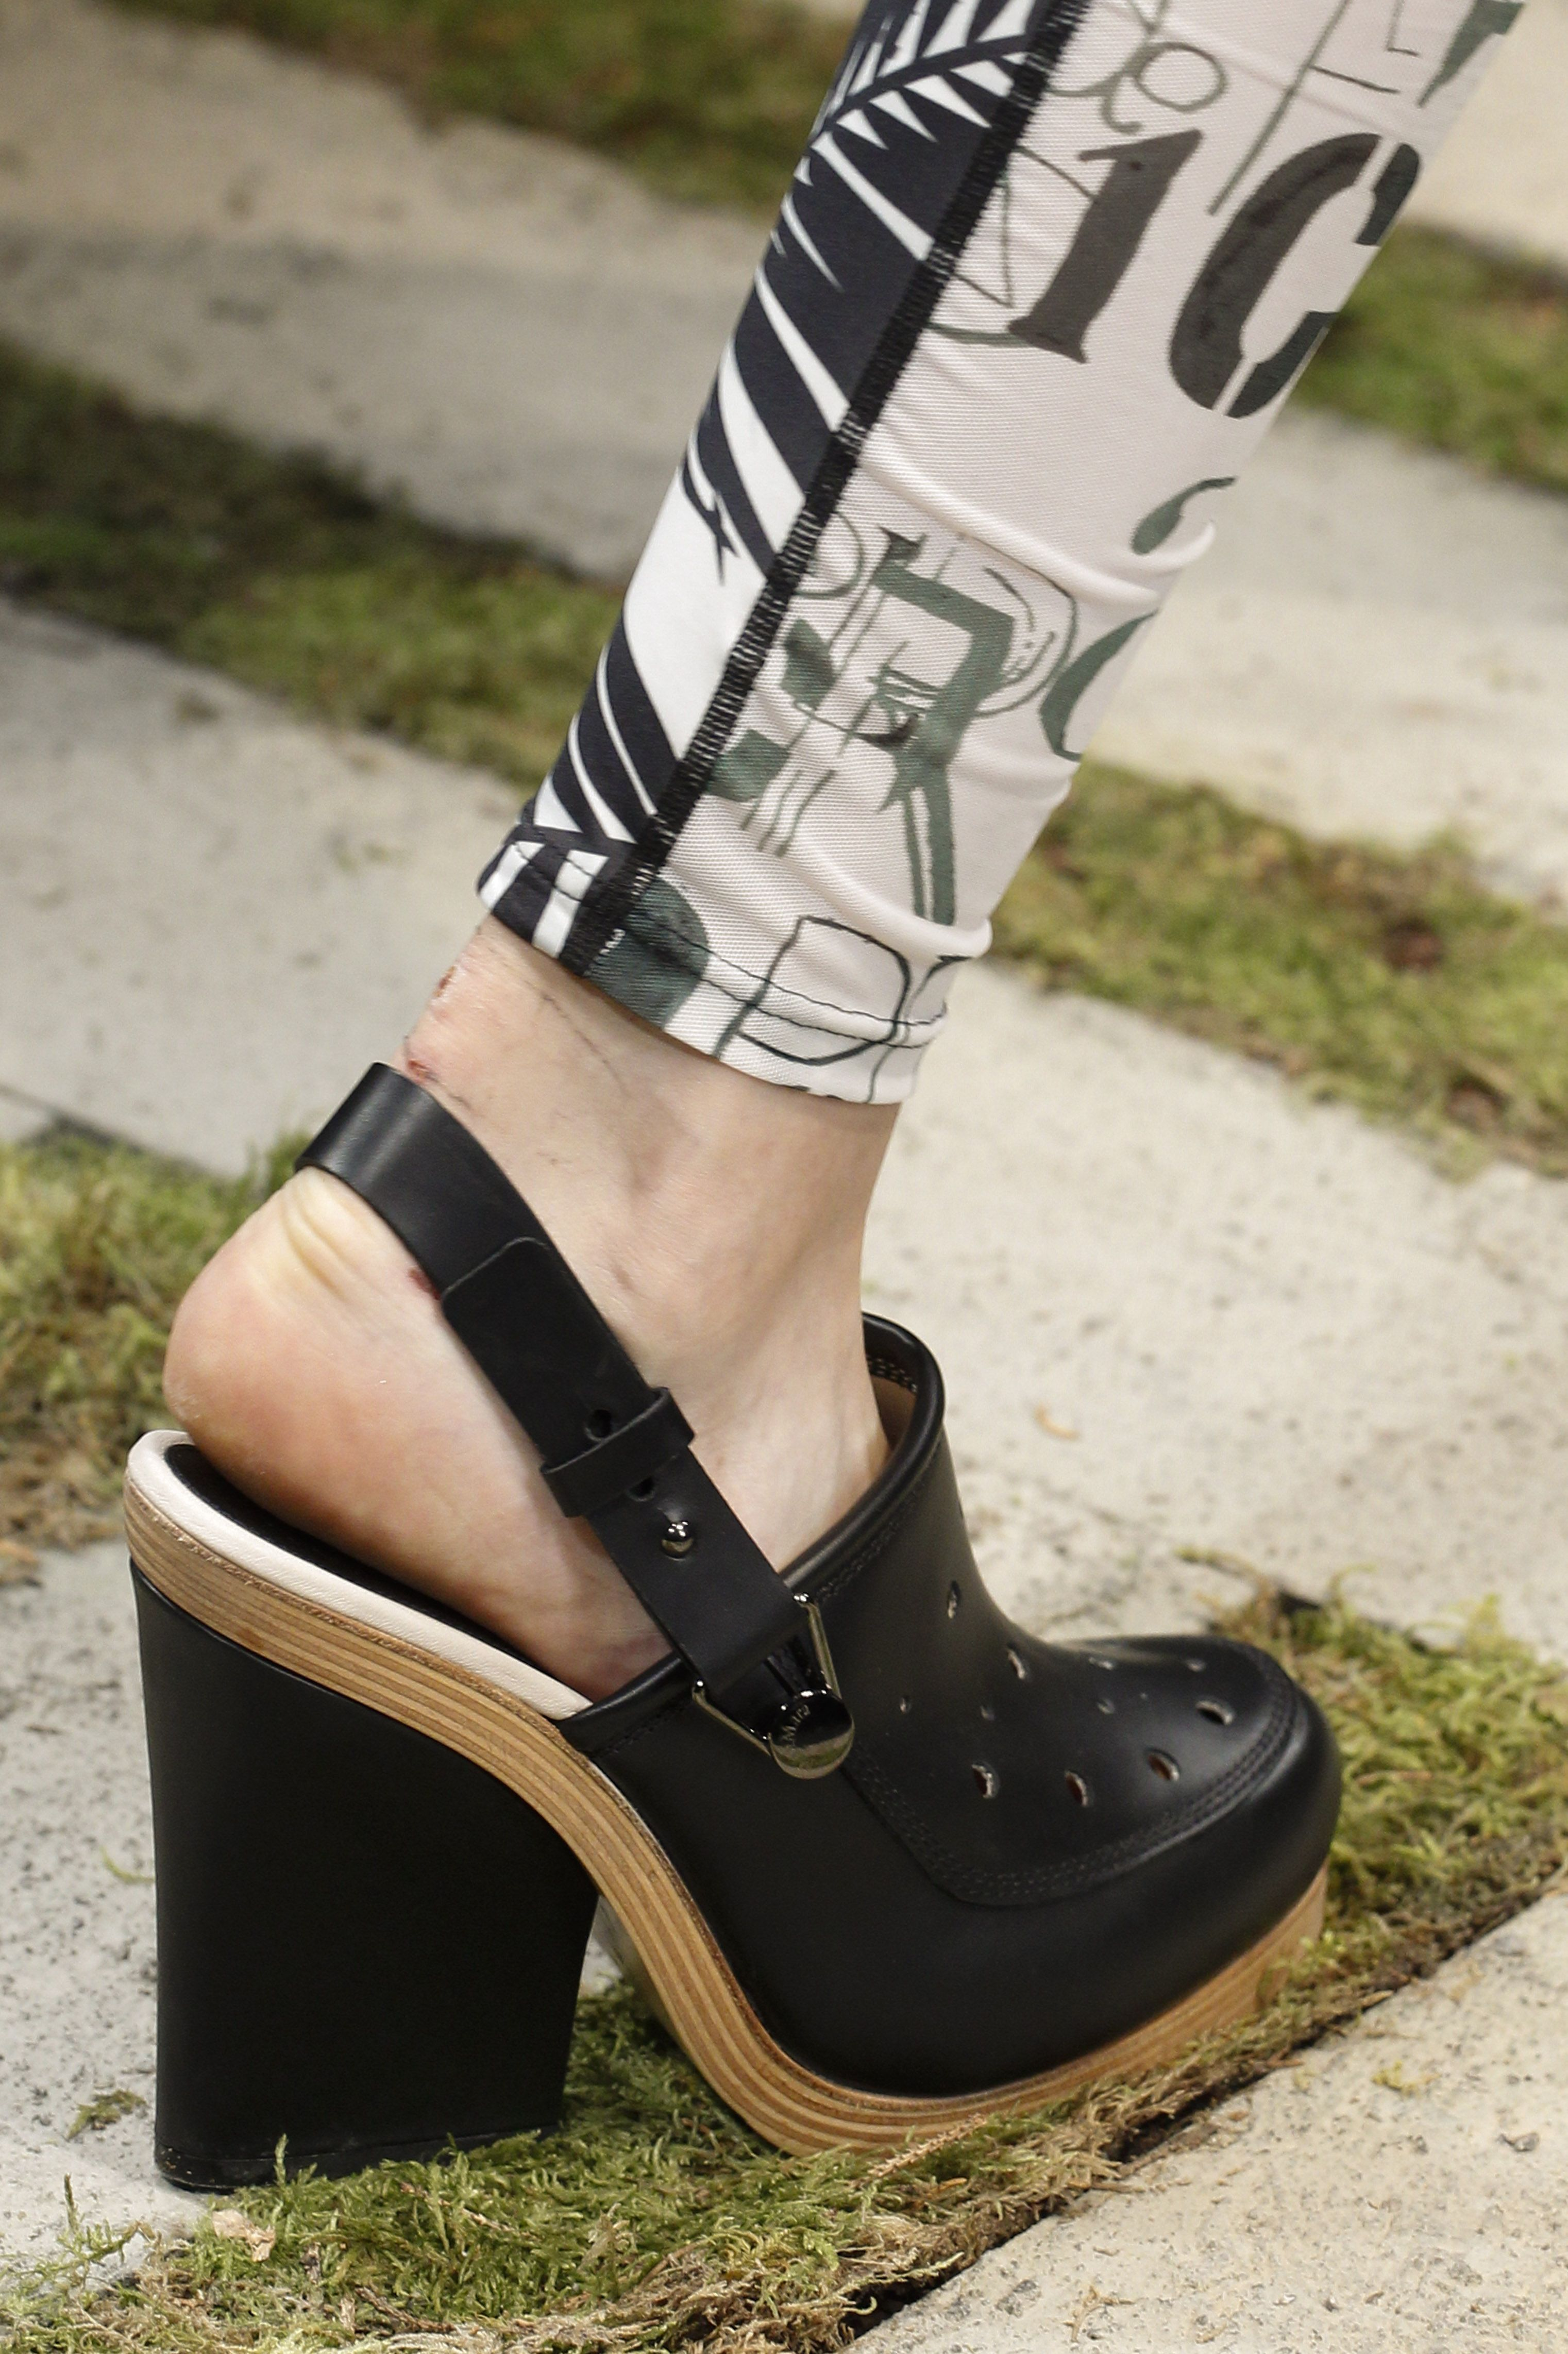 zapatos max mara 2017